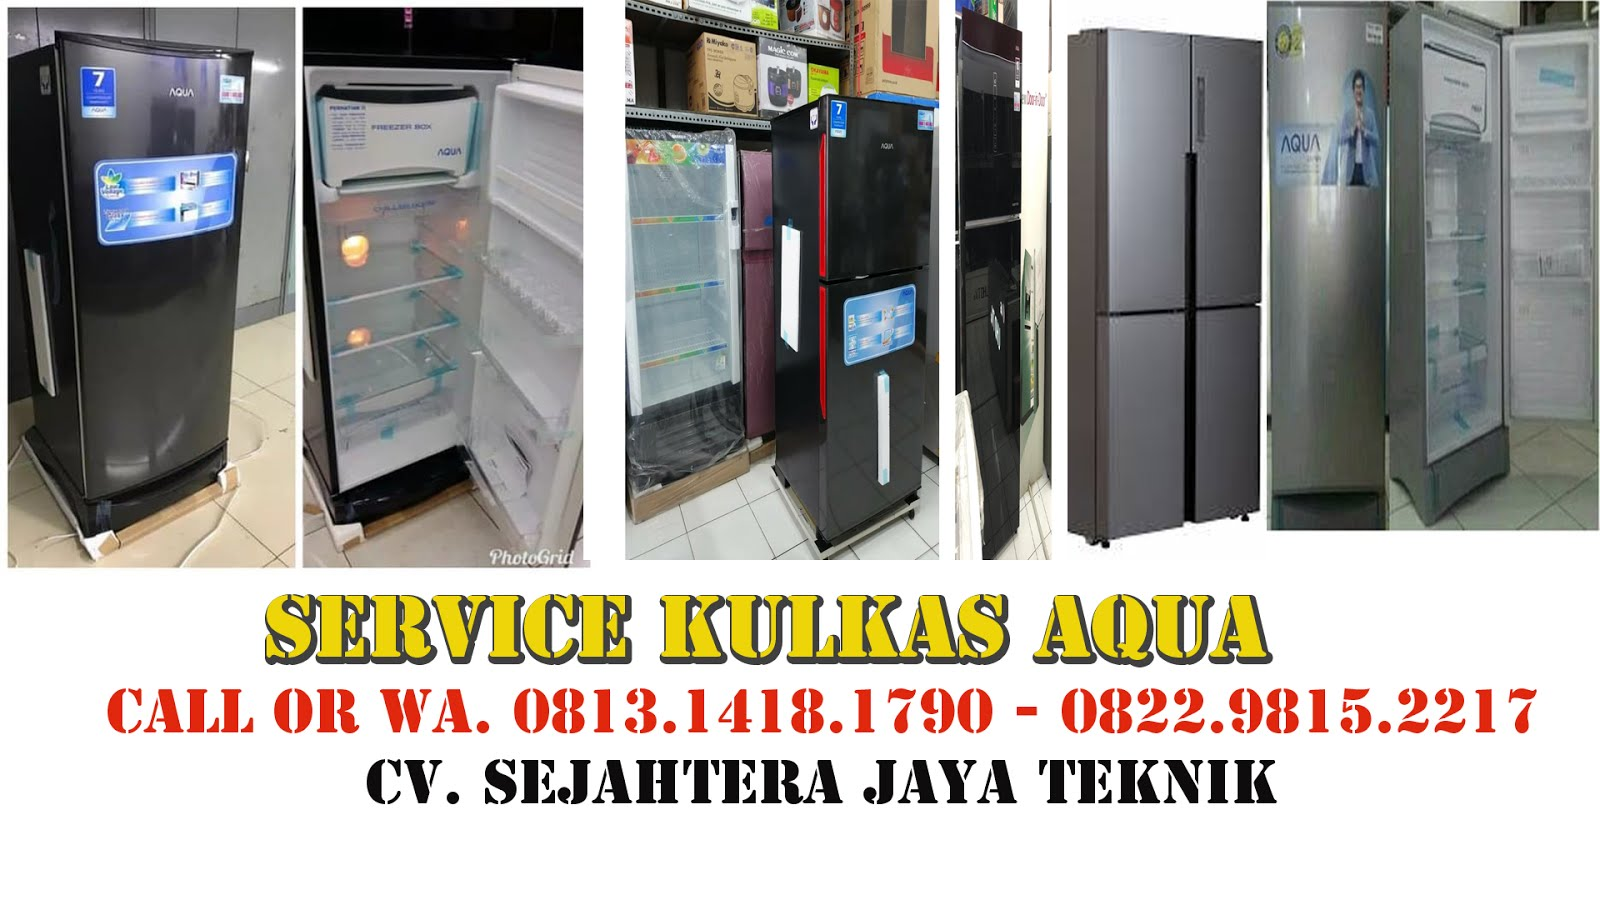 Service Kulkas Aqua di Jakarta Pusat